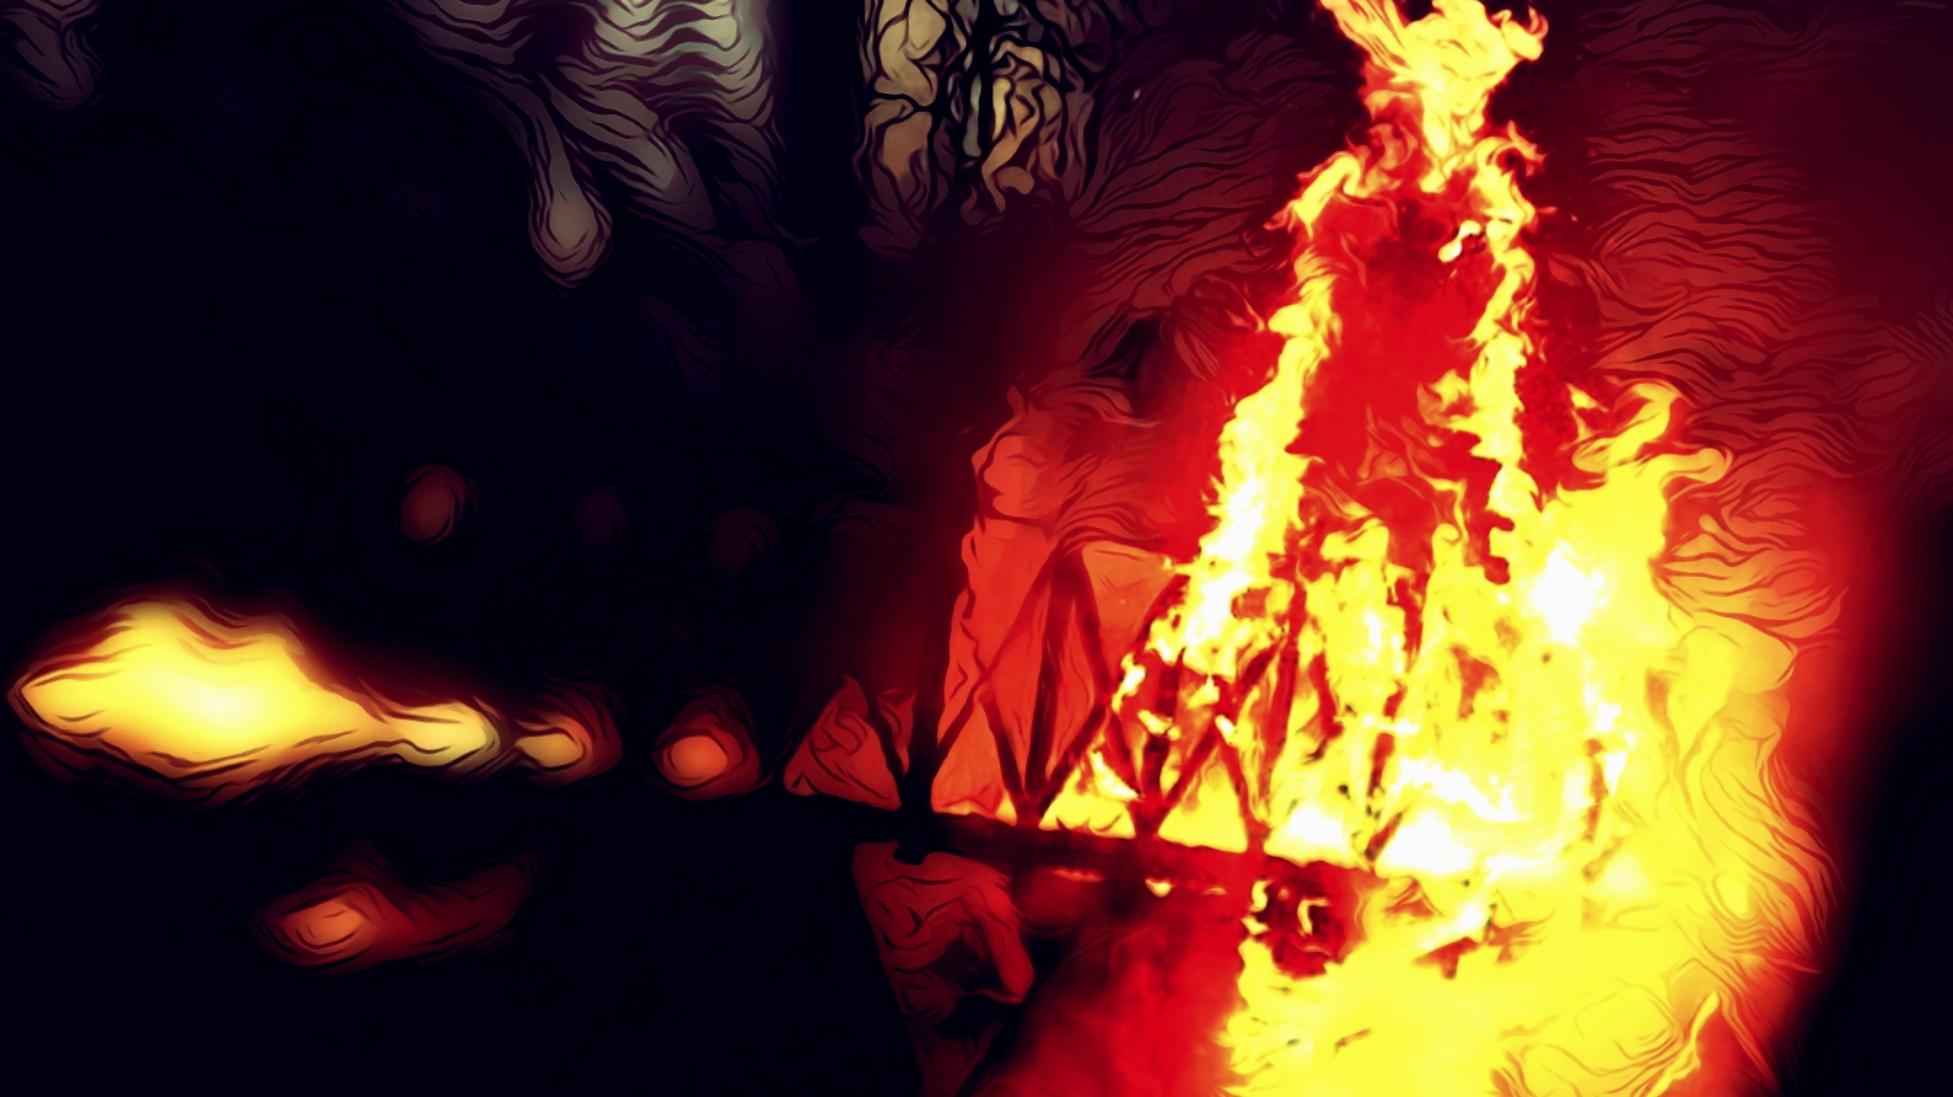 Dark digital illustration of woman burning on a bridge.